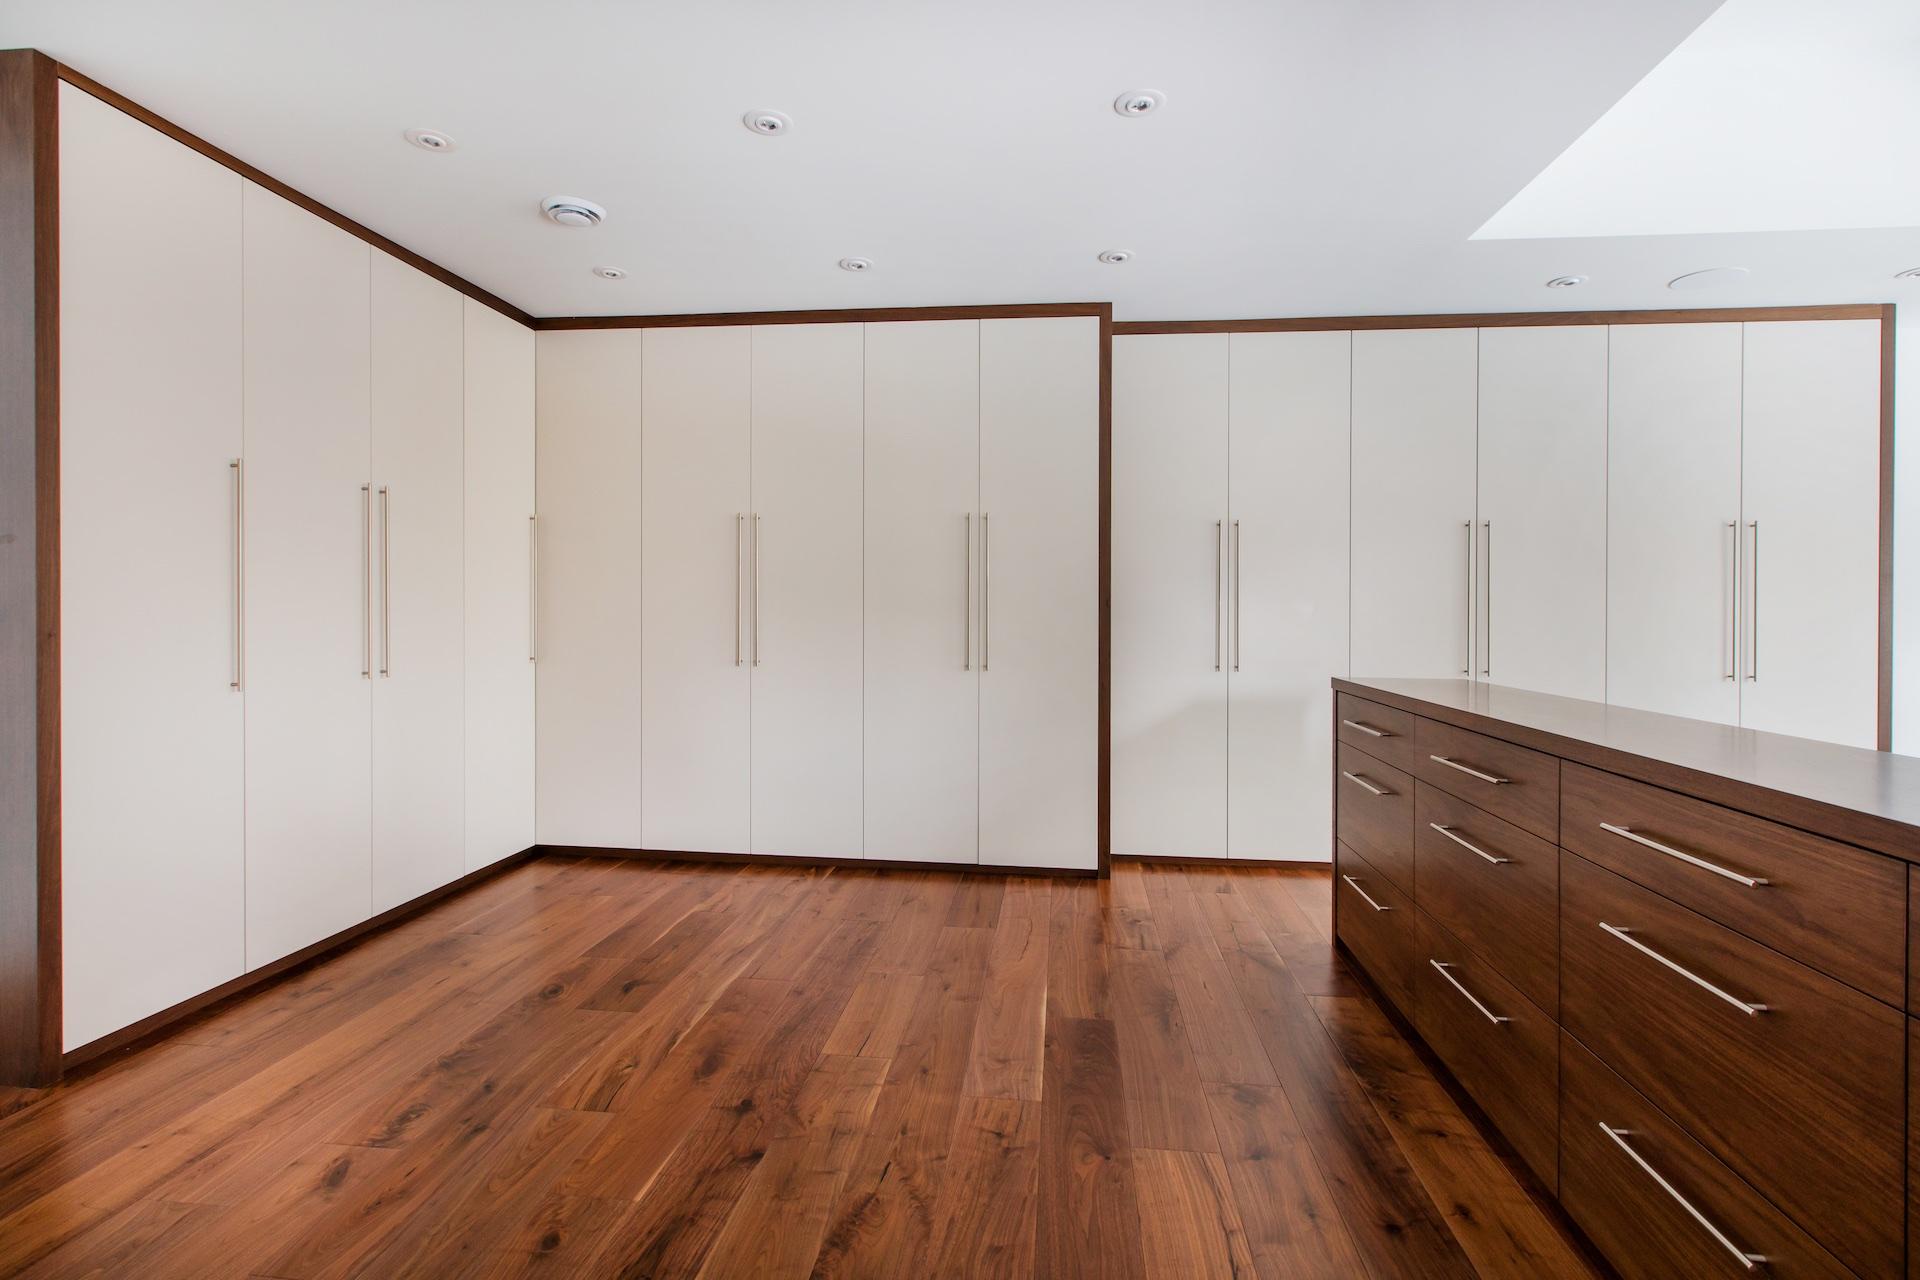 Wood floor with built in wardrobe